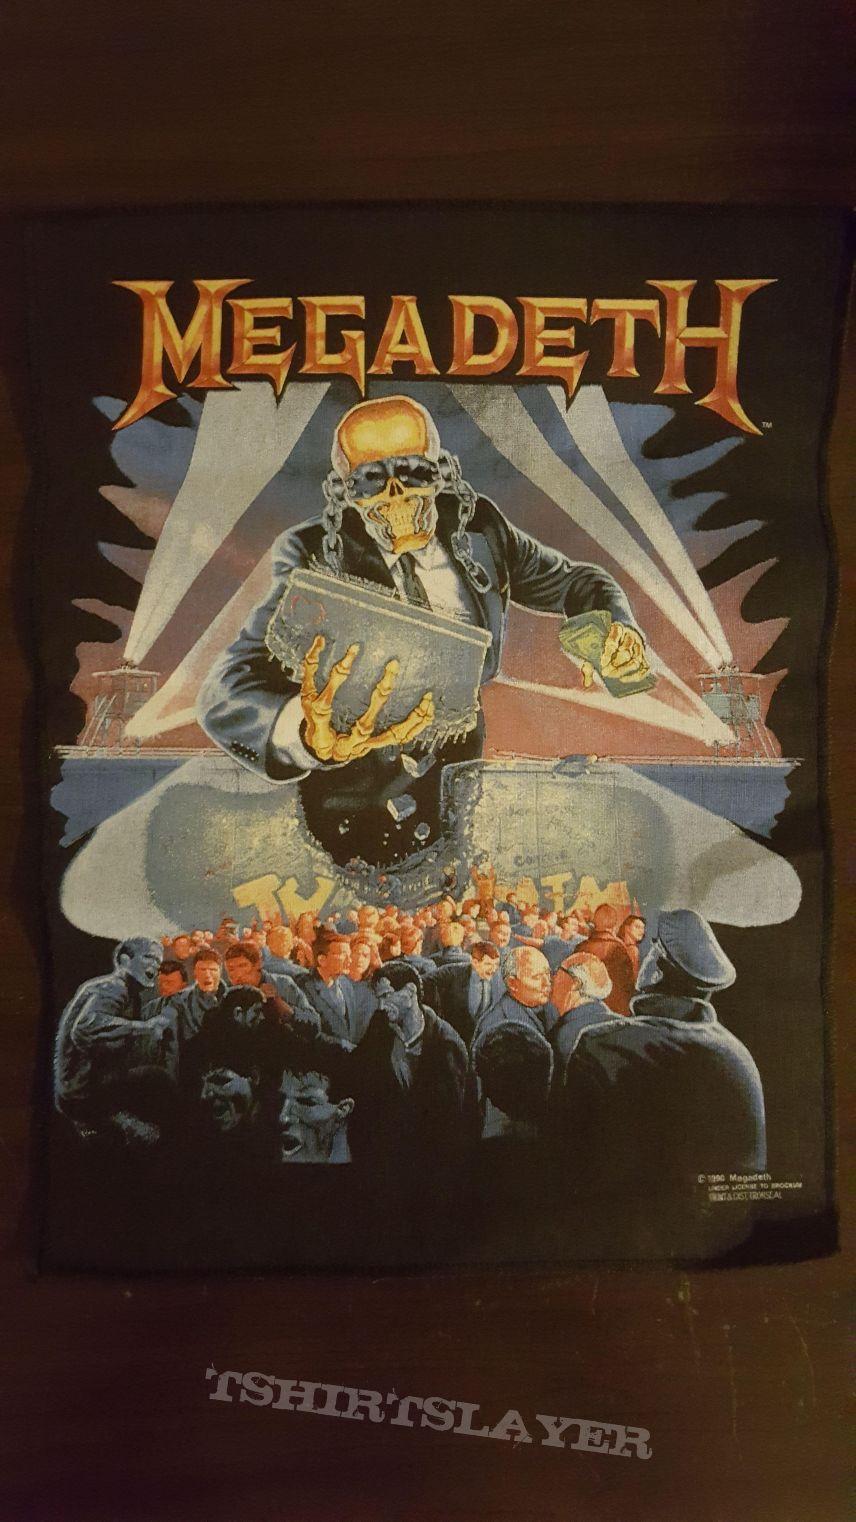 Megadeth - Berlin Wall 1990 backpatch